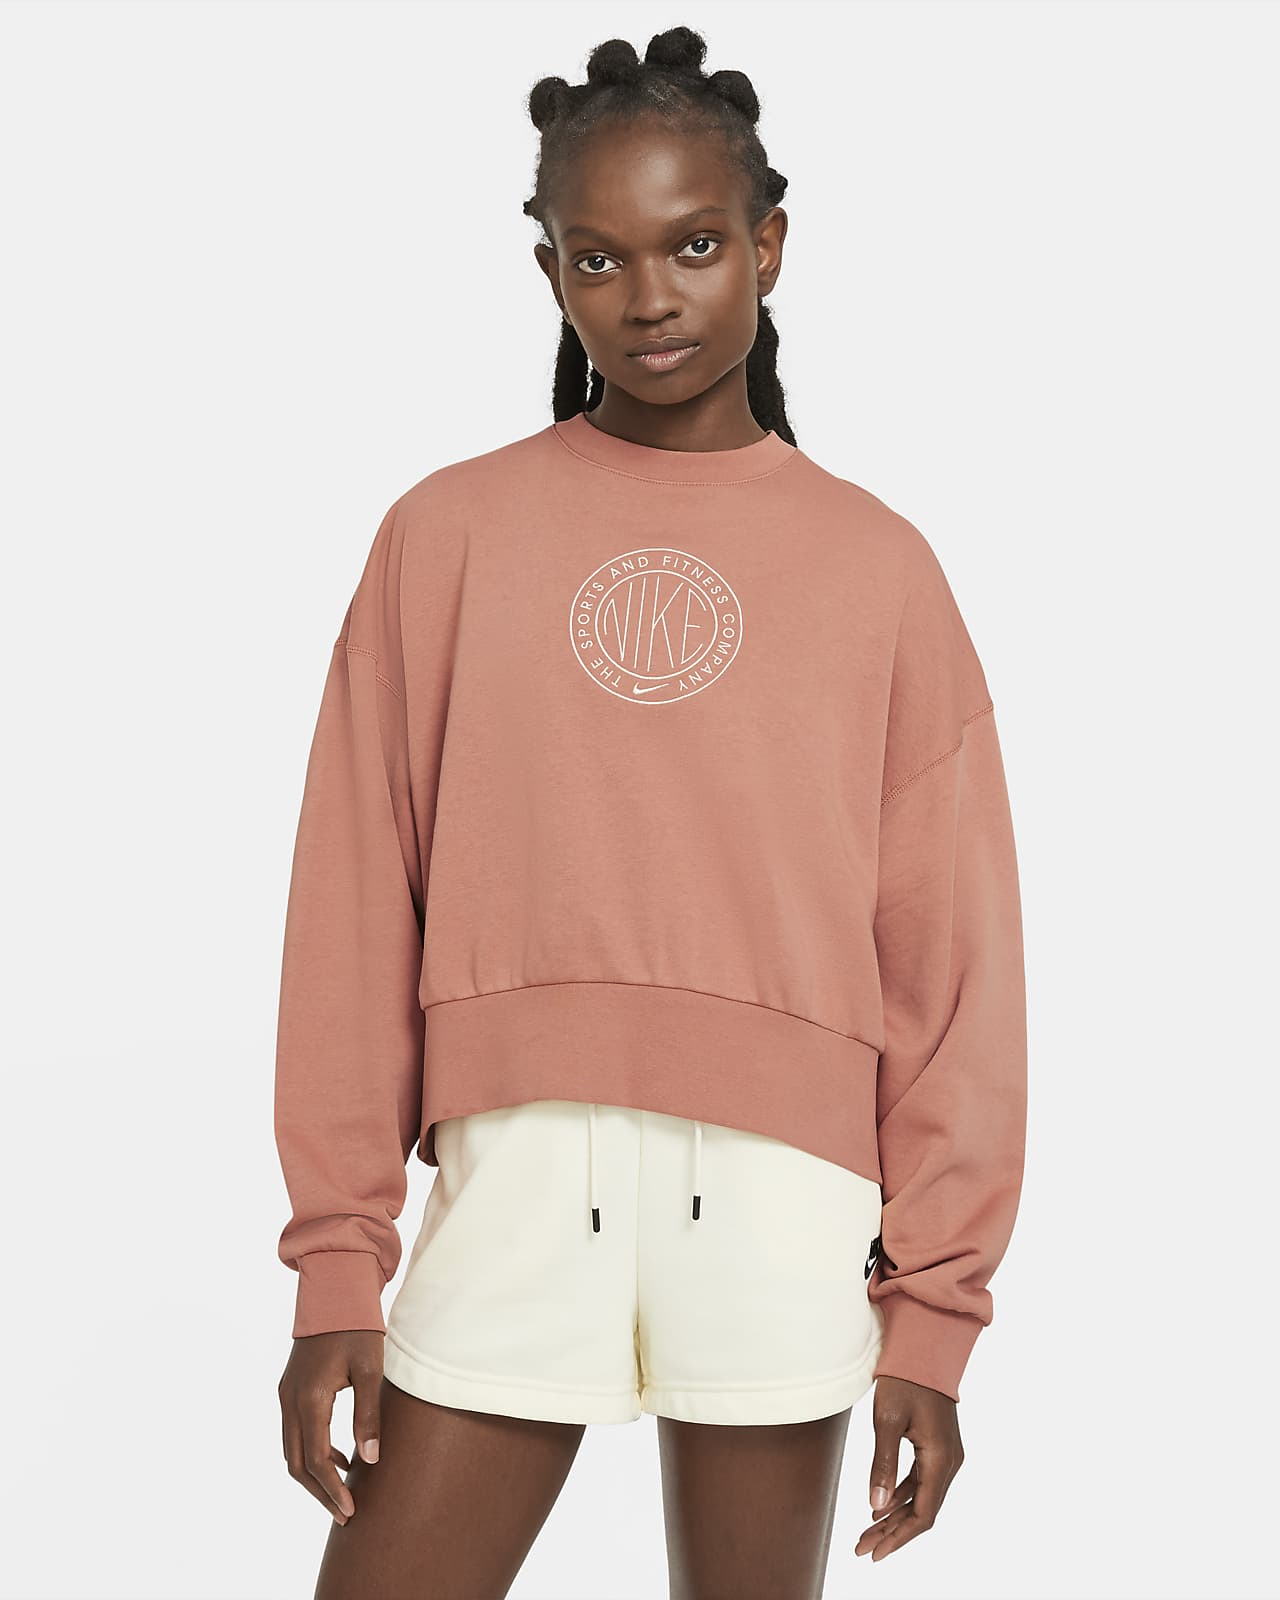 Sudadera de cuello redondo para mujer Nike Sportswear Femme